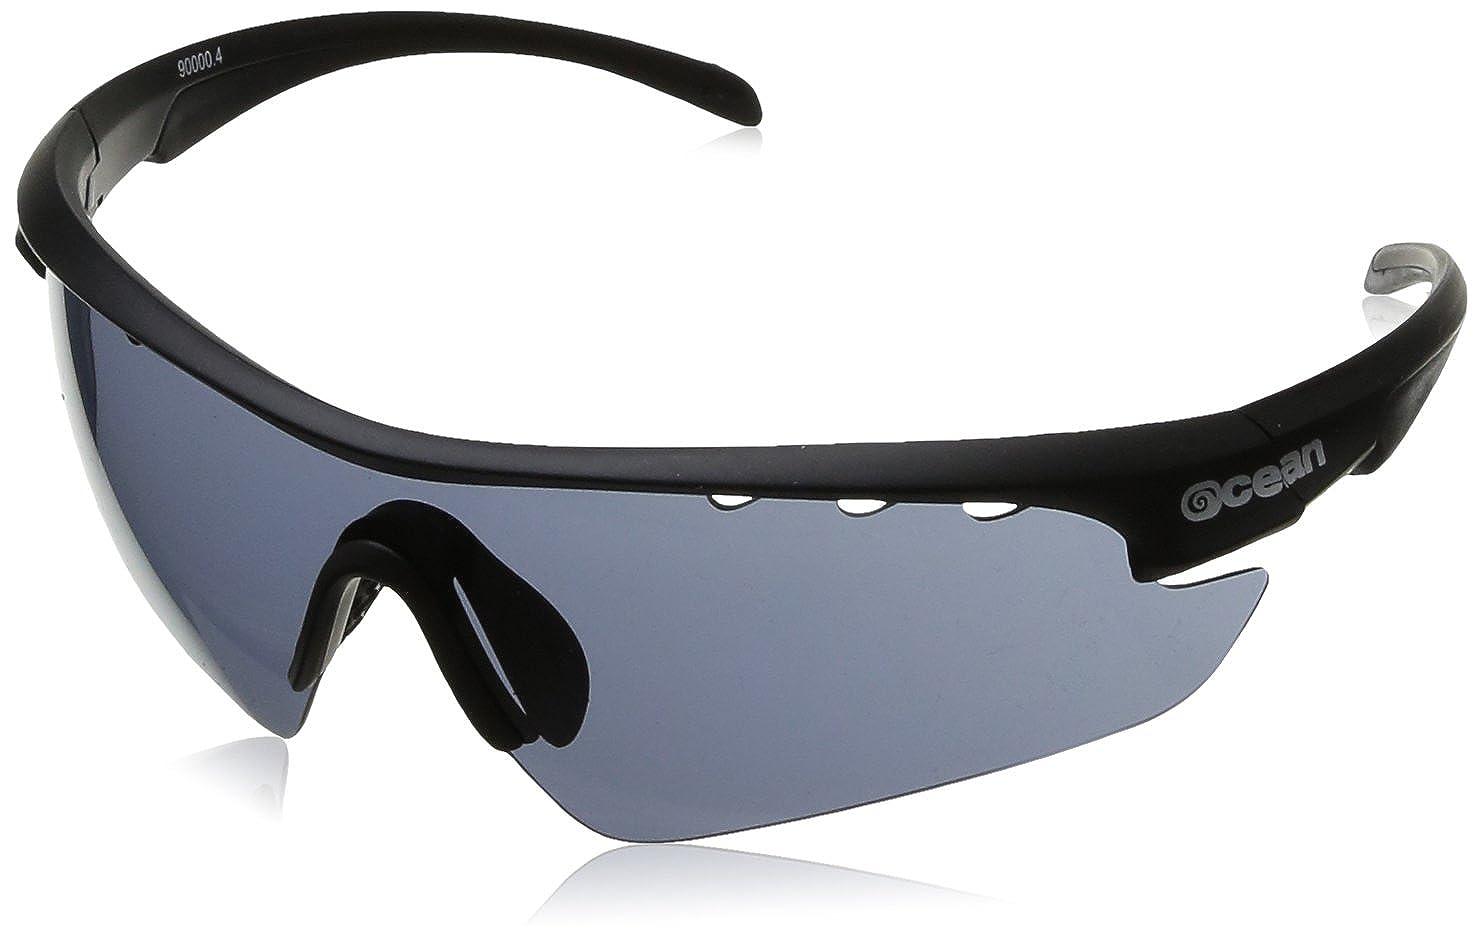 Amazon.com: Ocean – Gafas de sol polarizadas anteojos de sol ...